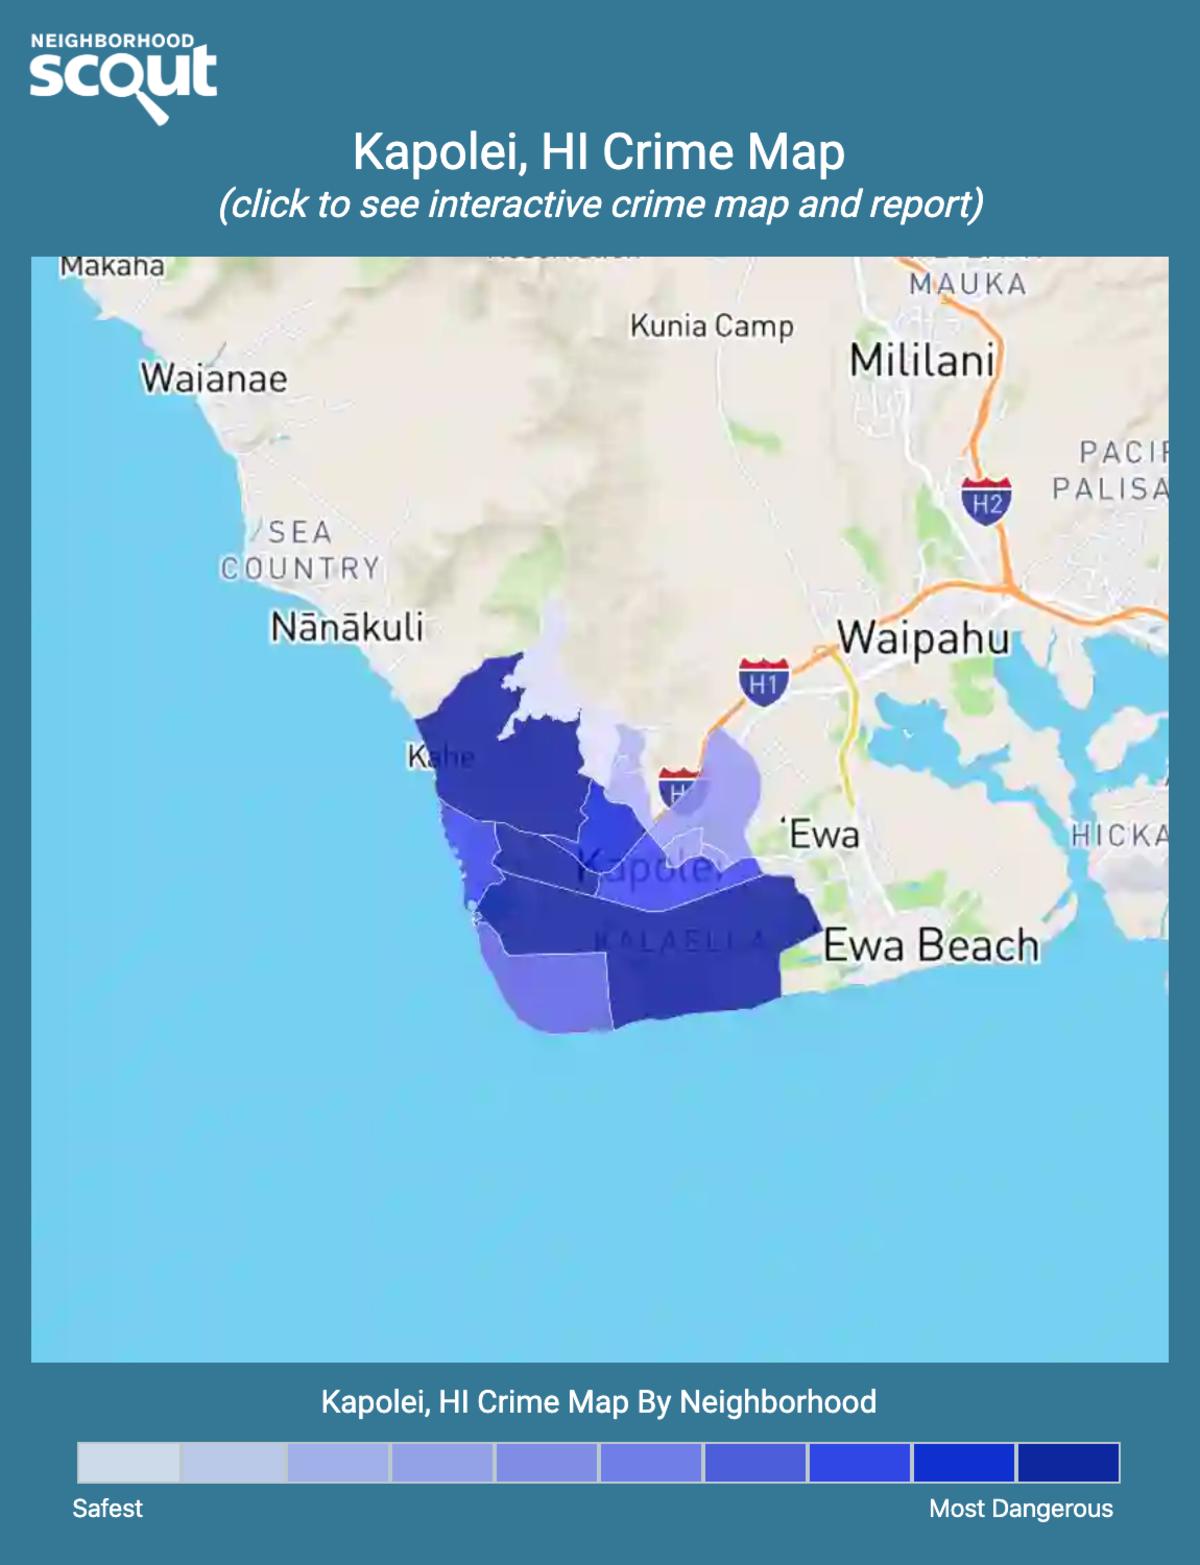 Kapolei, Hawaii crime map